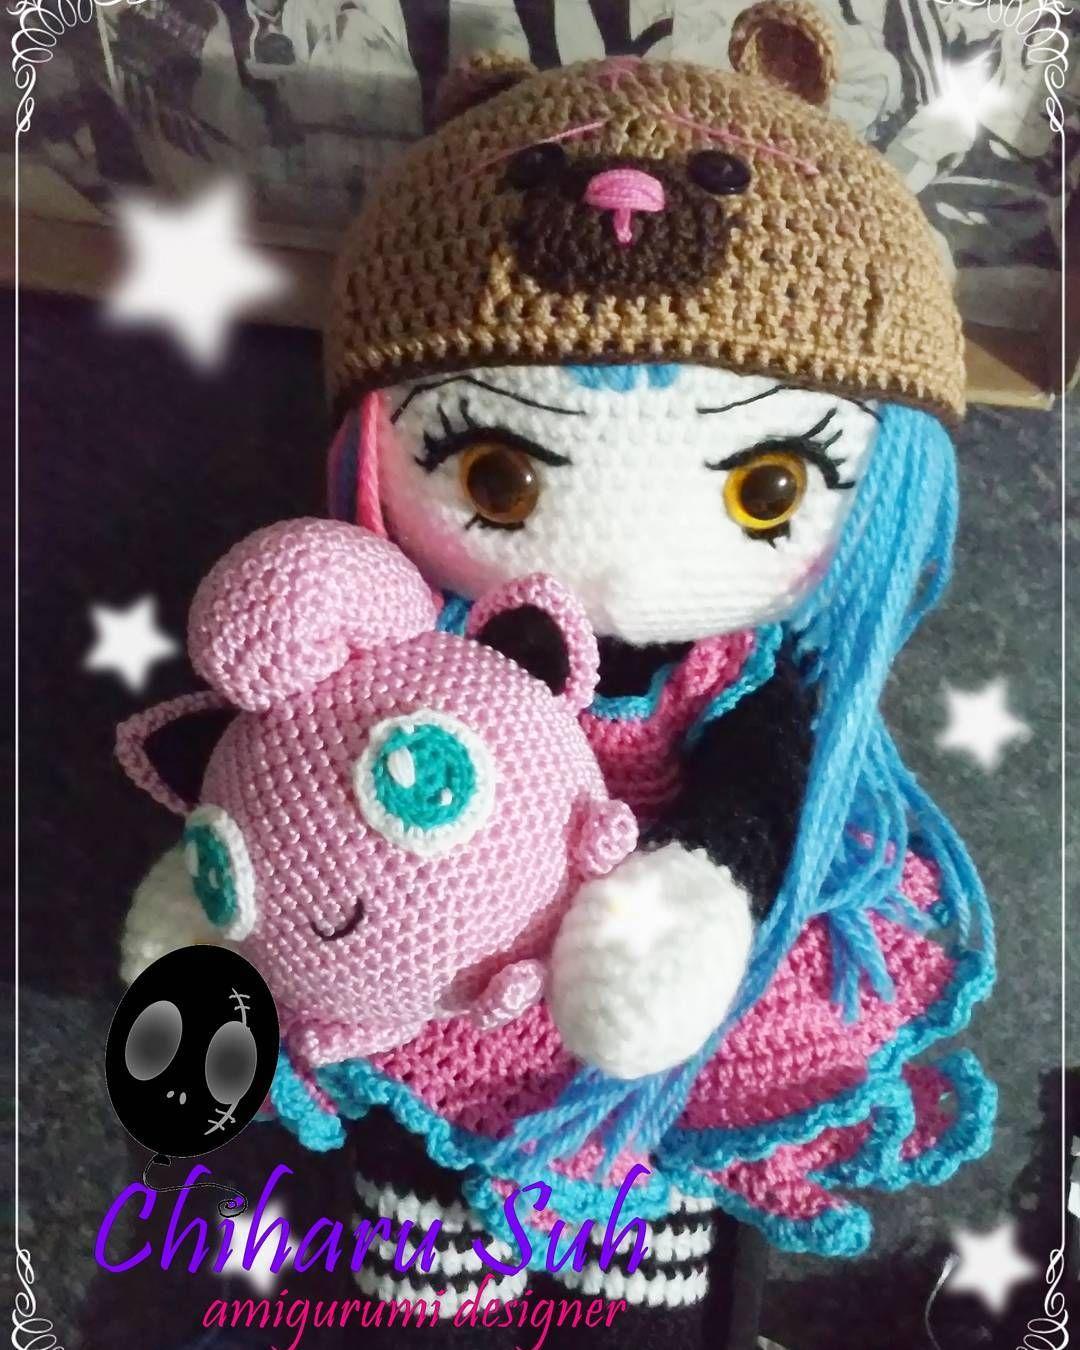 Boa noite... Voltando pra o meu casulo de crochet... Bye ❤